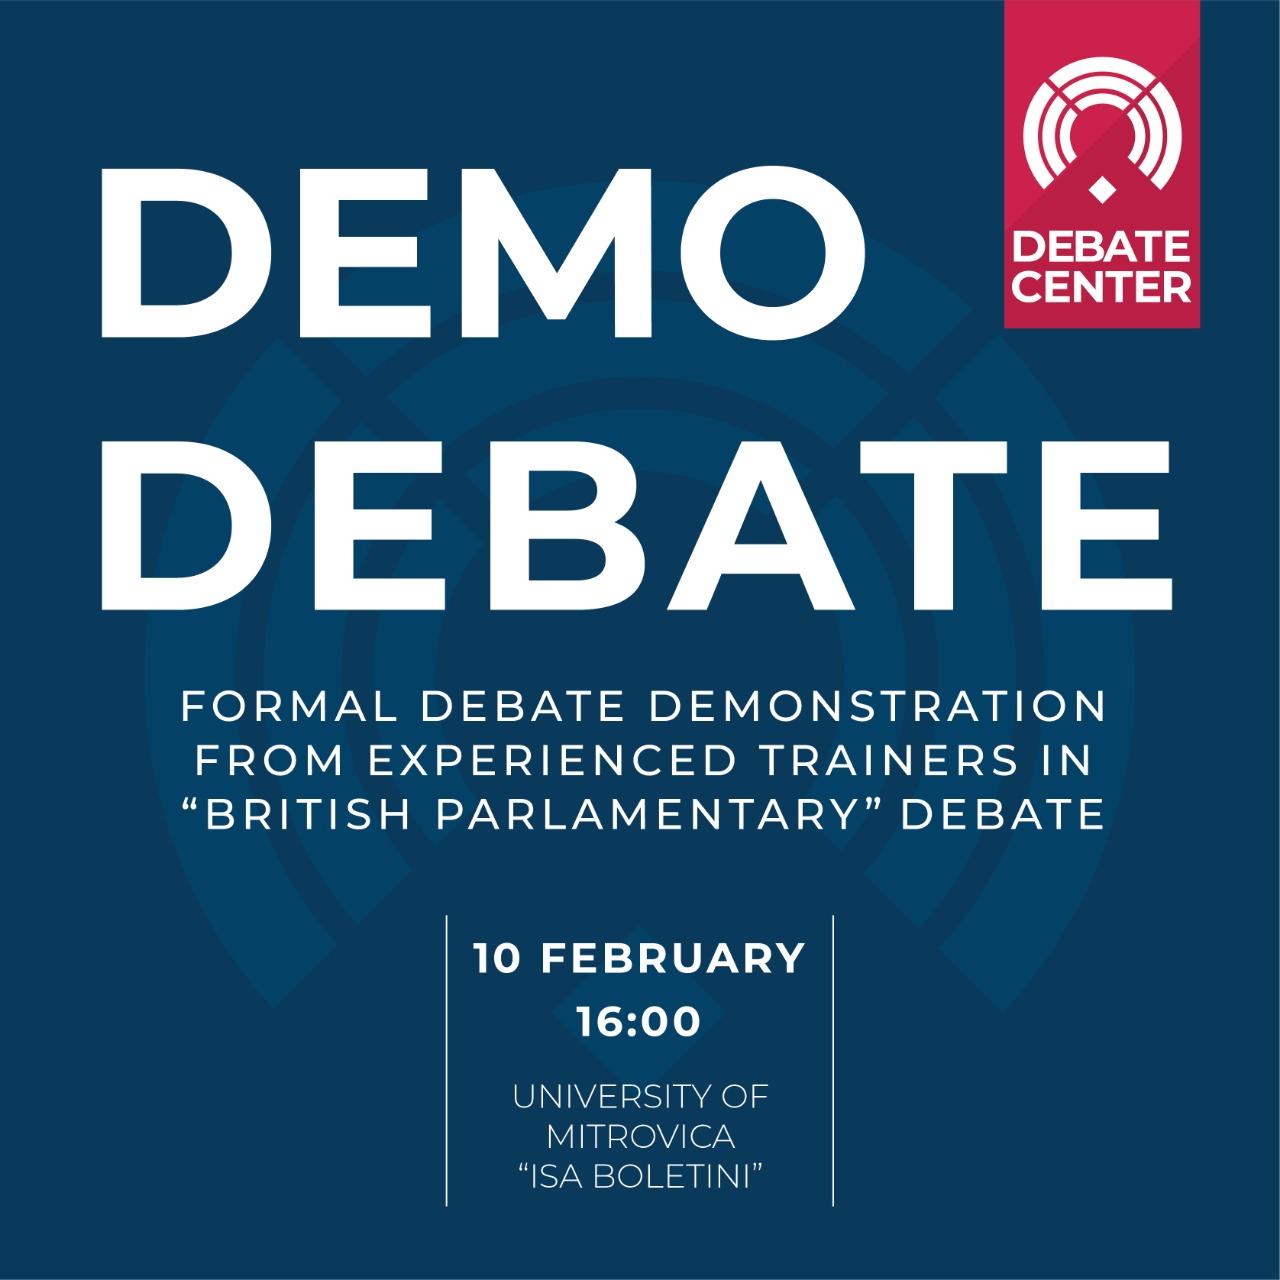 Debat demonstrativ në UMIB